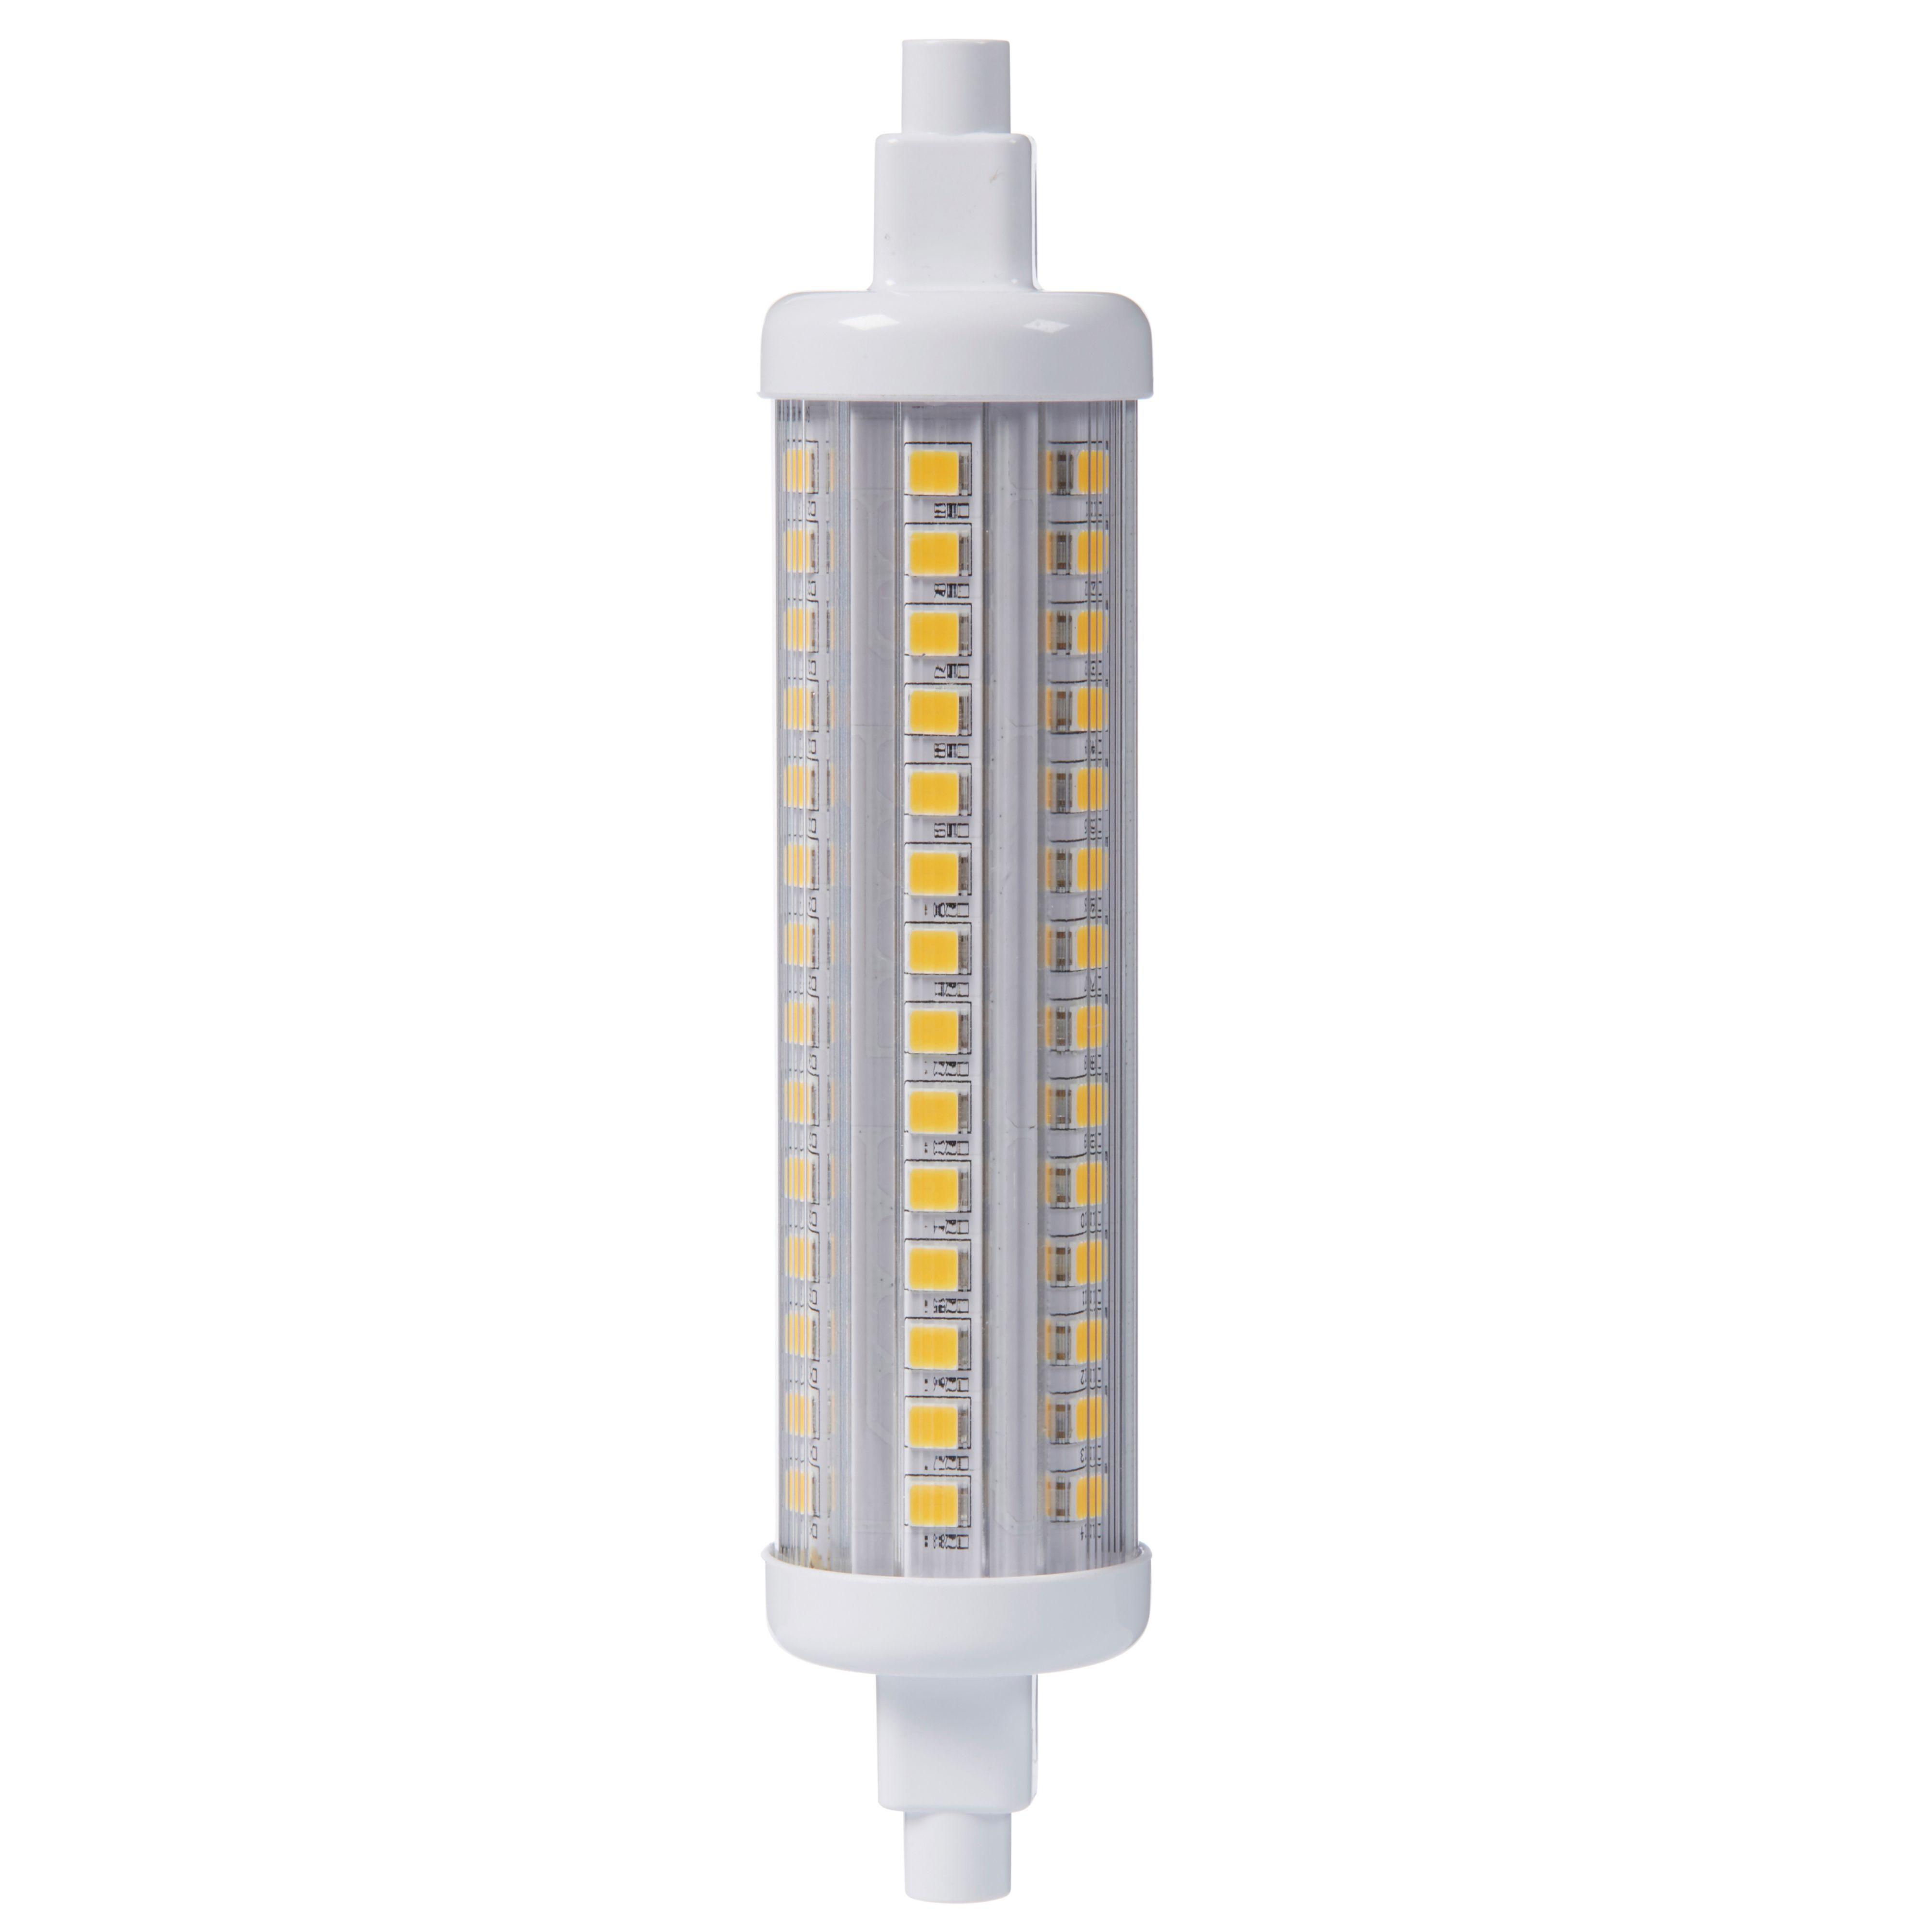 Diall R7S 1200lm LED Stick Light Bulb